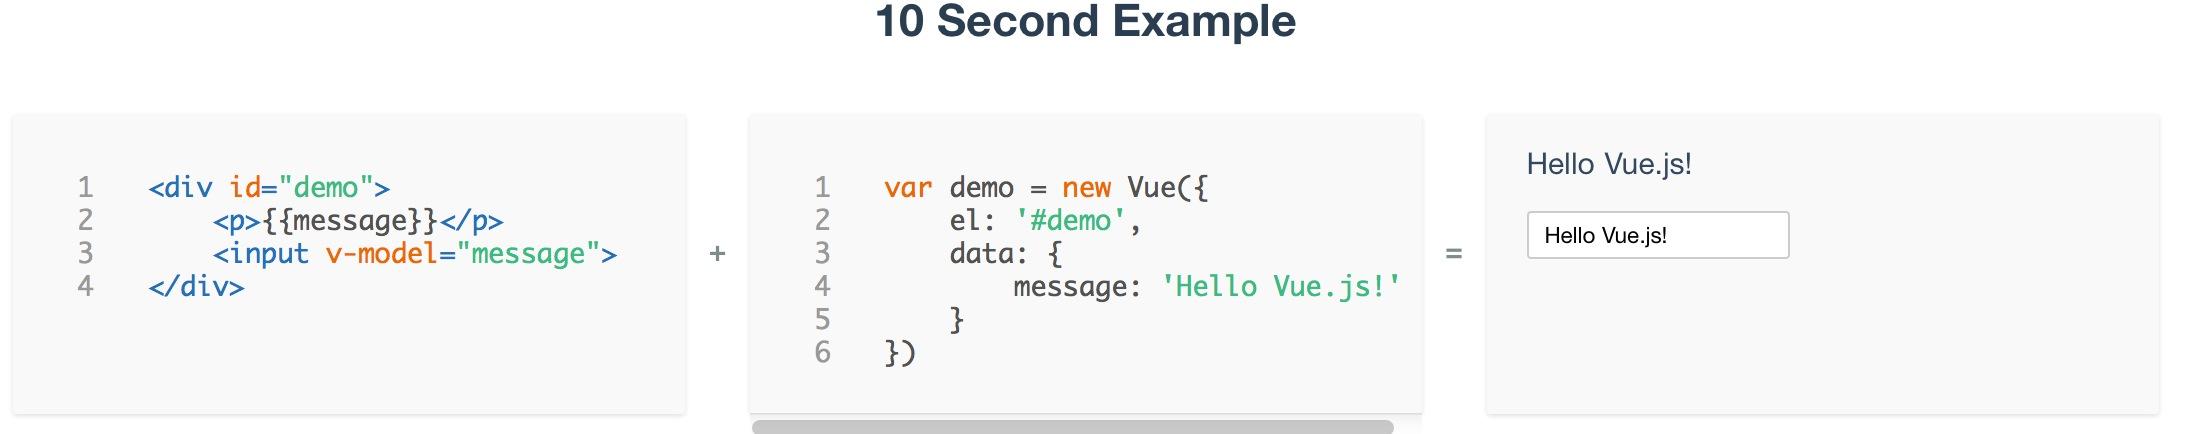 轻量级 JavaScript 框架 Vue.js